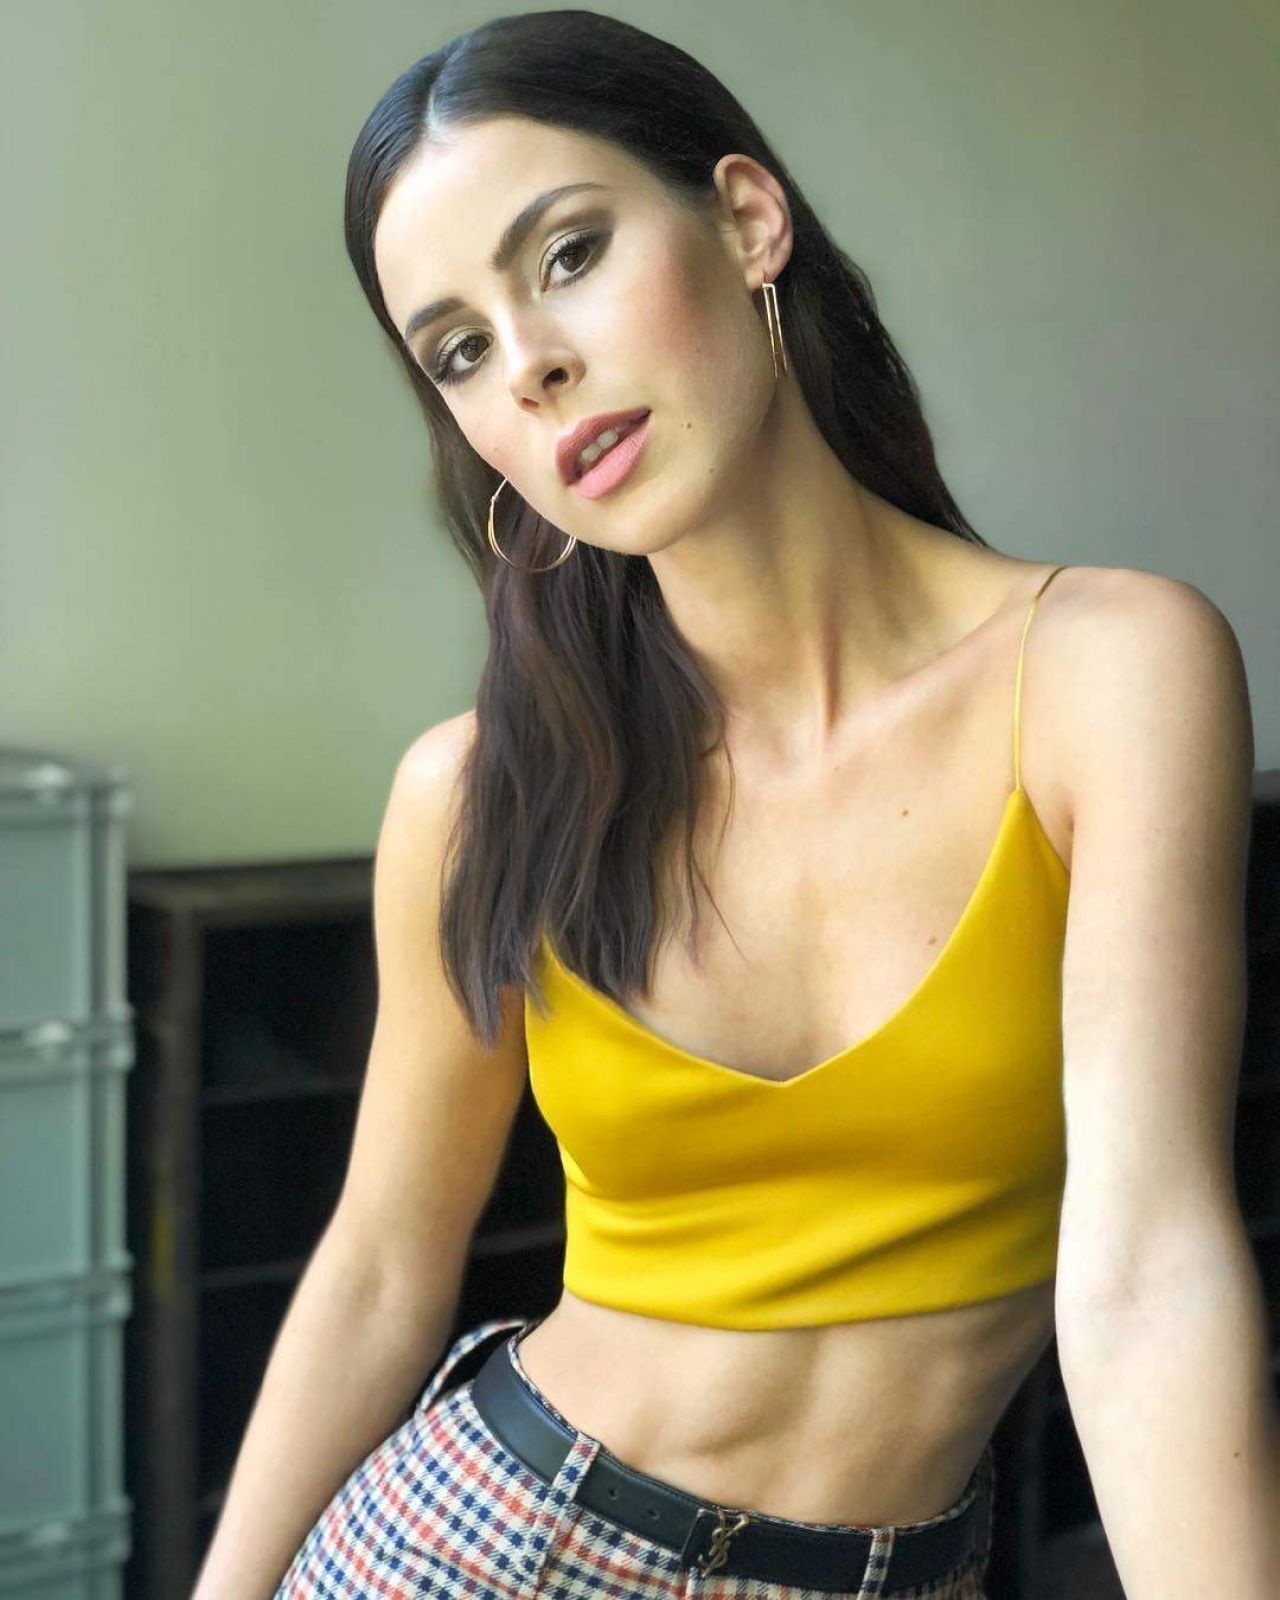 Lena Landrut